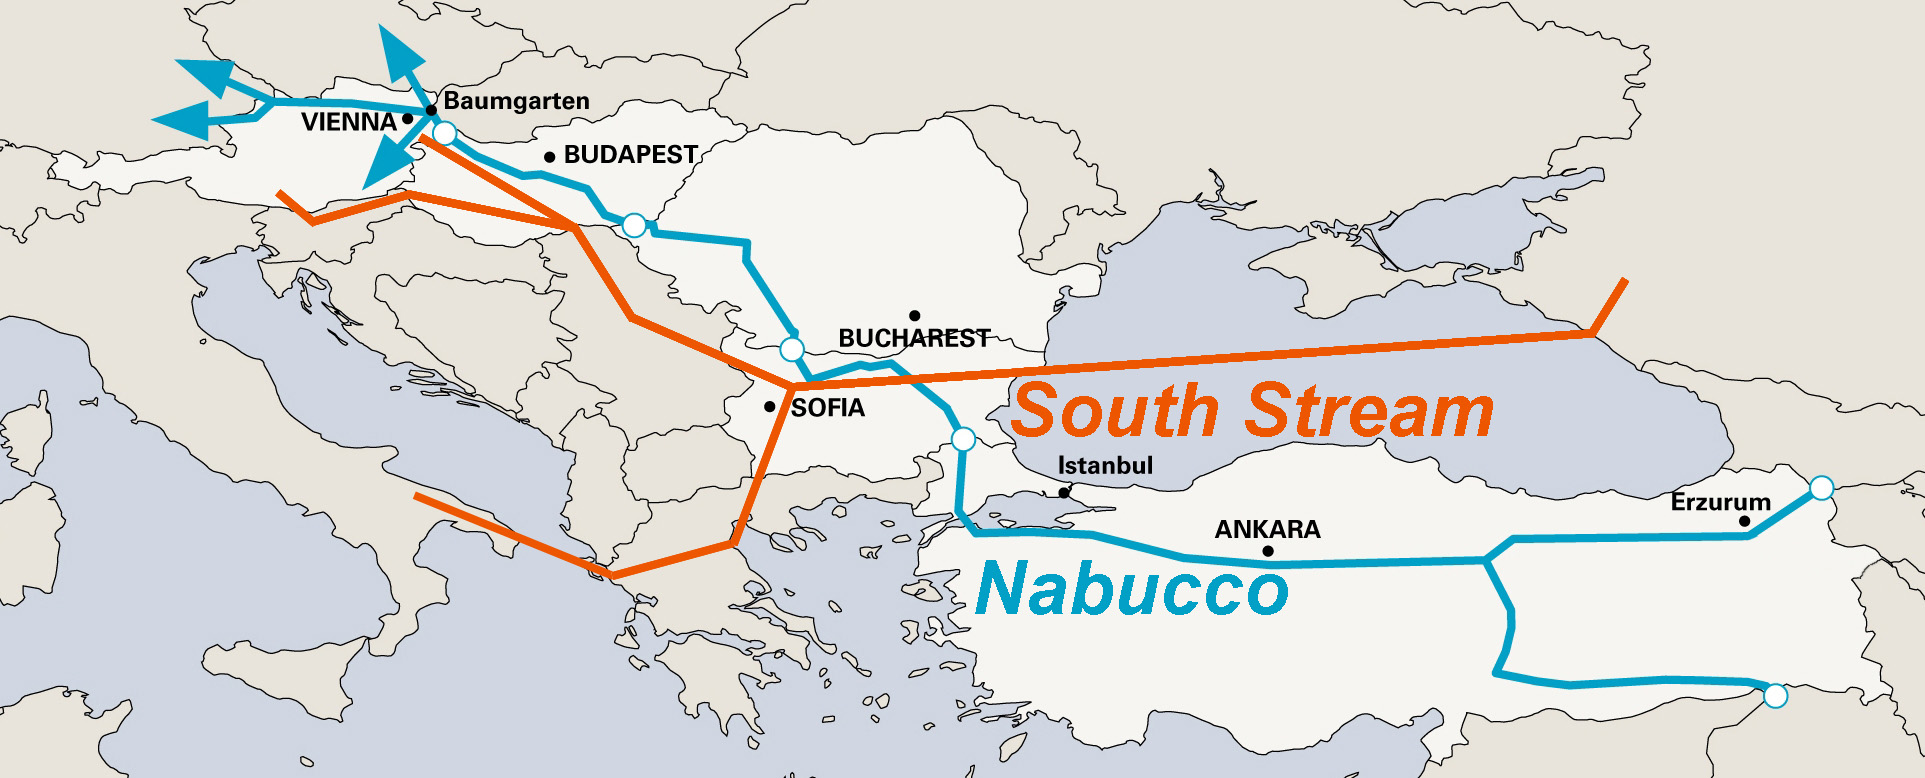 http://upload.wikimedia.org/wikipedia/commons/c/c2/2010Nabucco_and_South_Stream.jpg